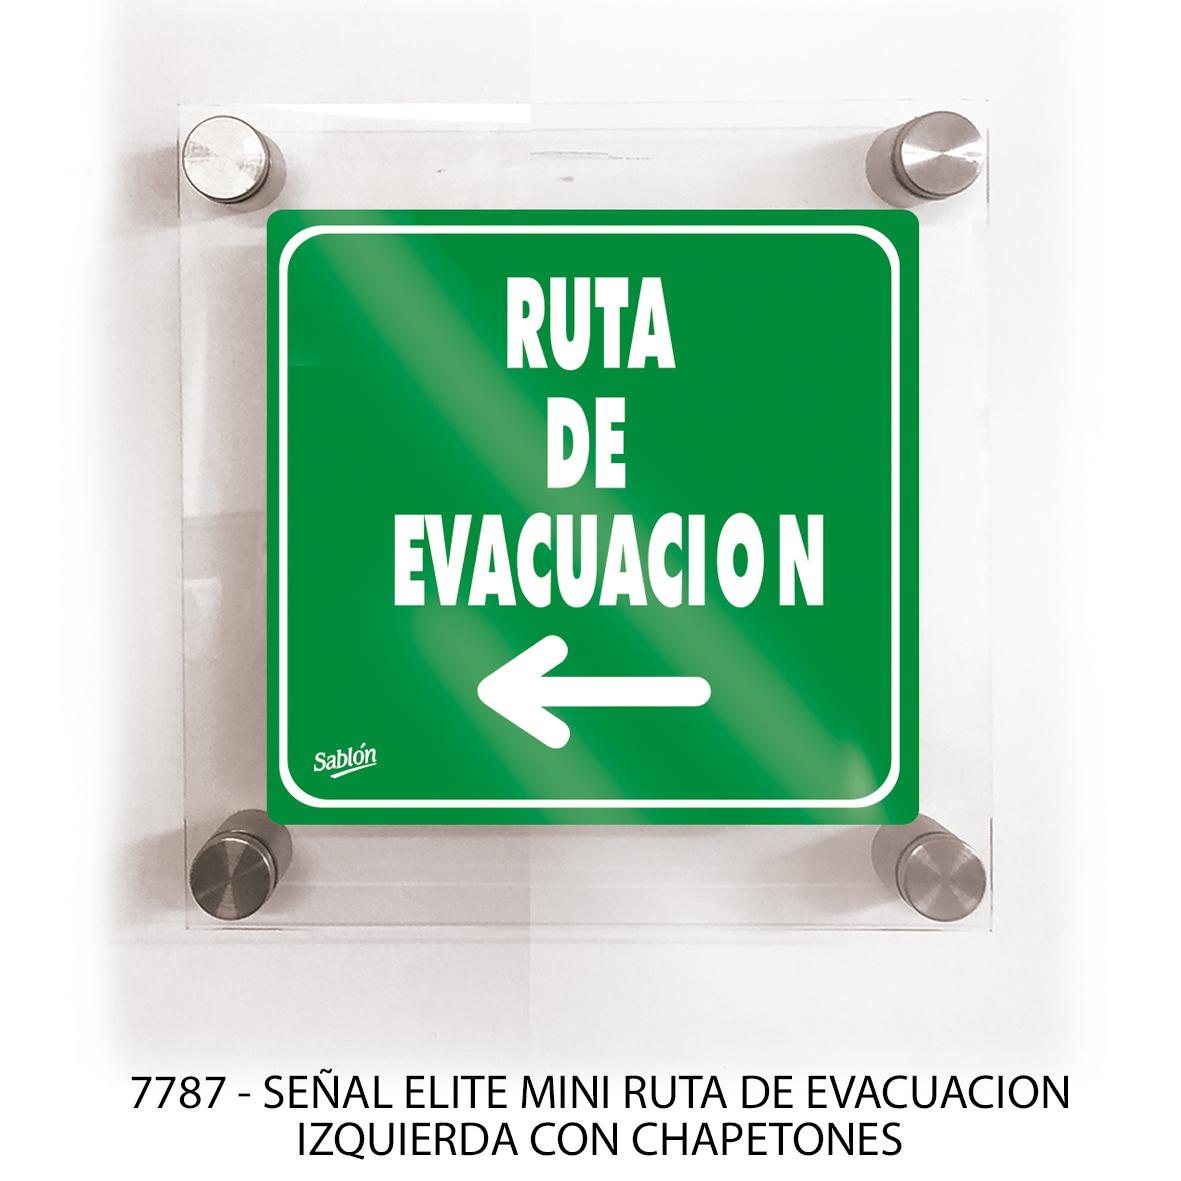 Señal ruta de evacuación izquierda con chapetones línea elite mini modelo 7787 Sablón